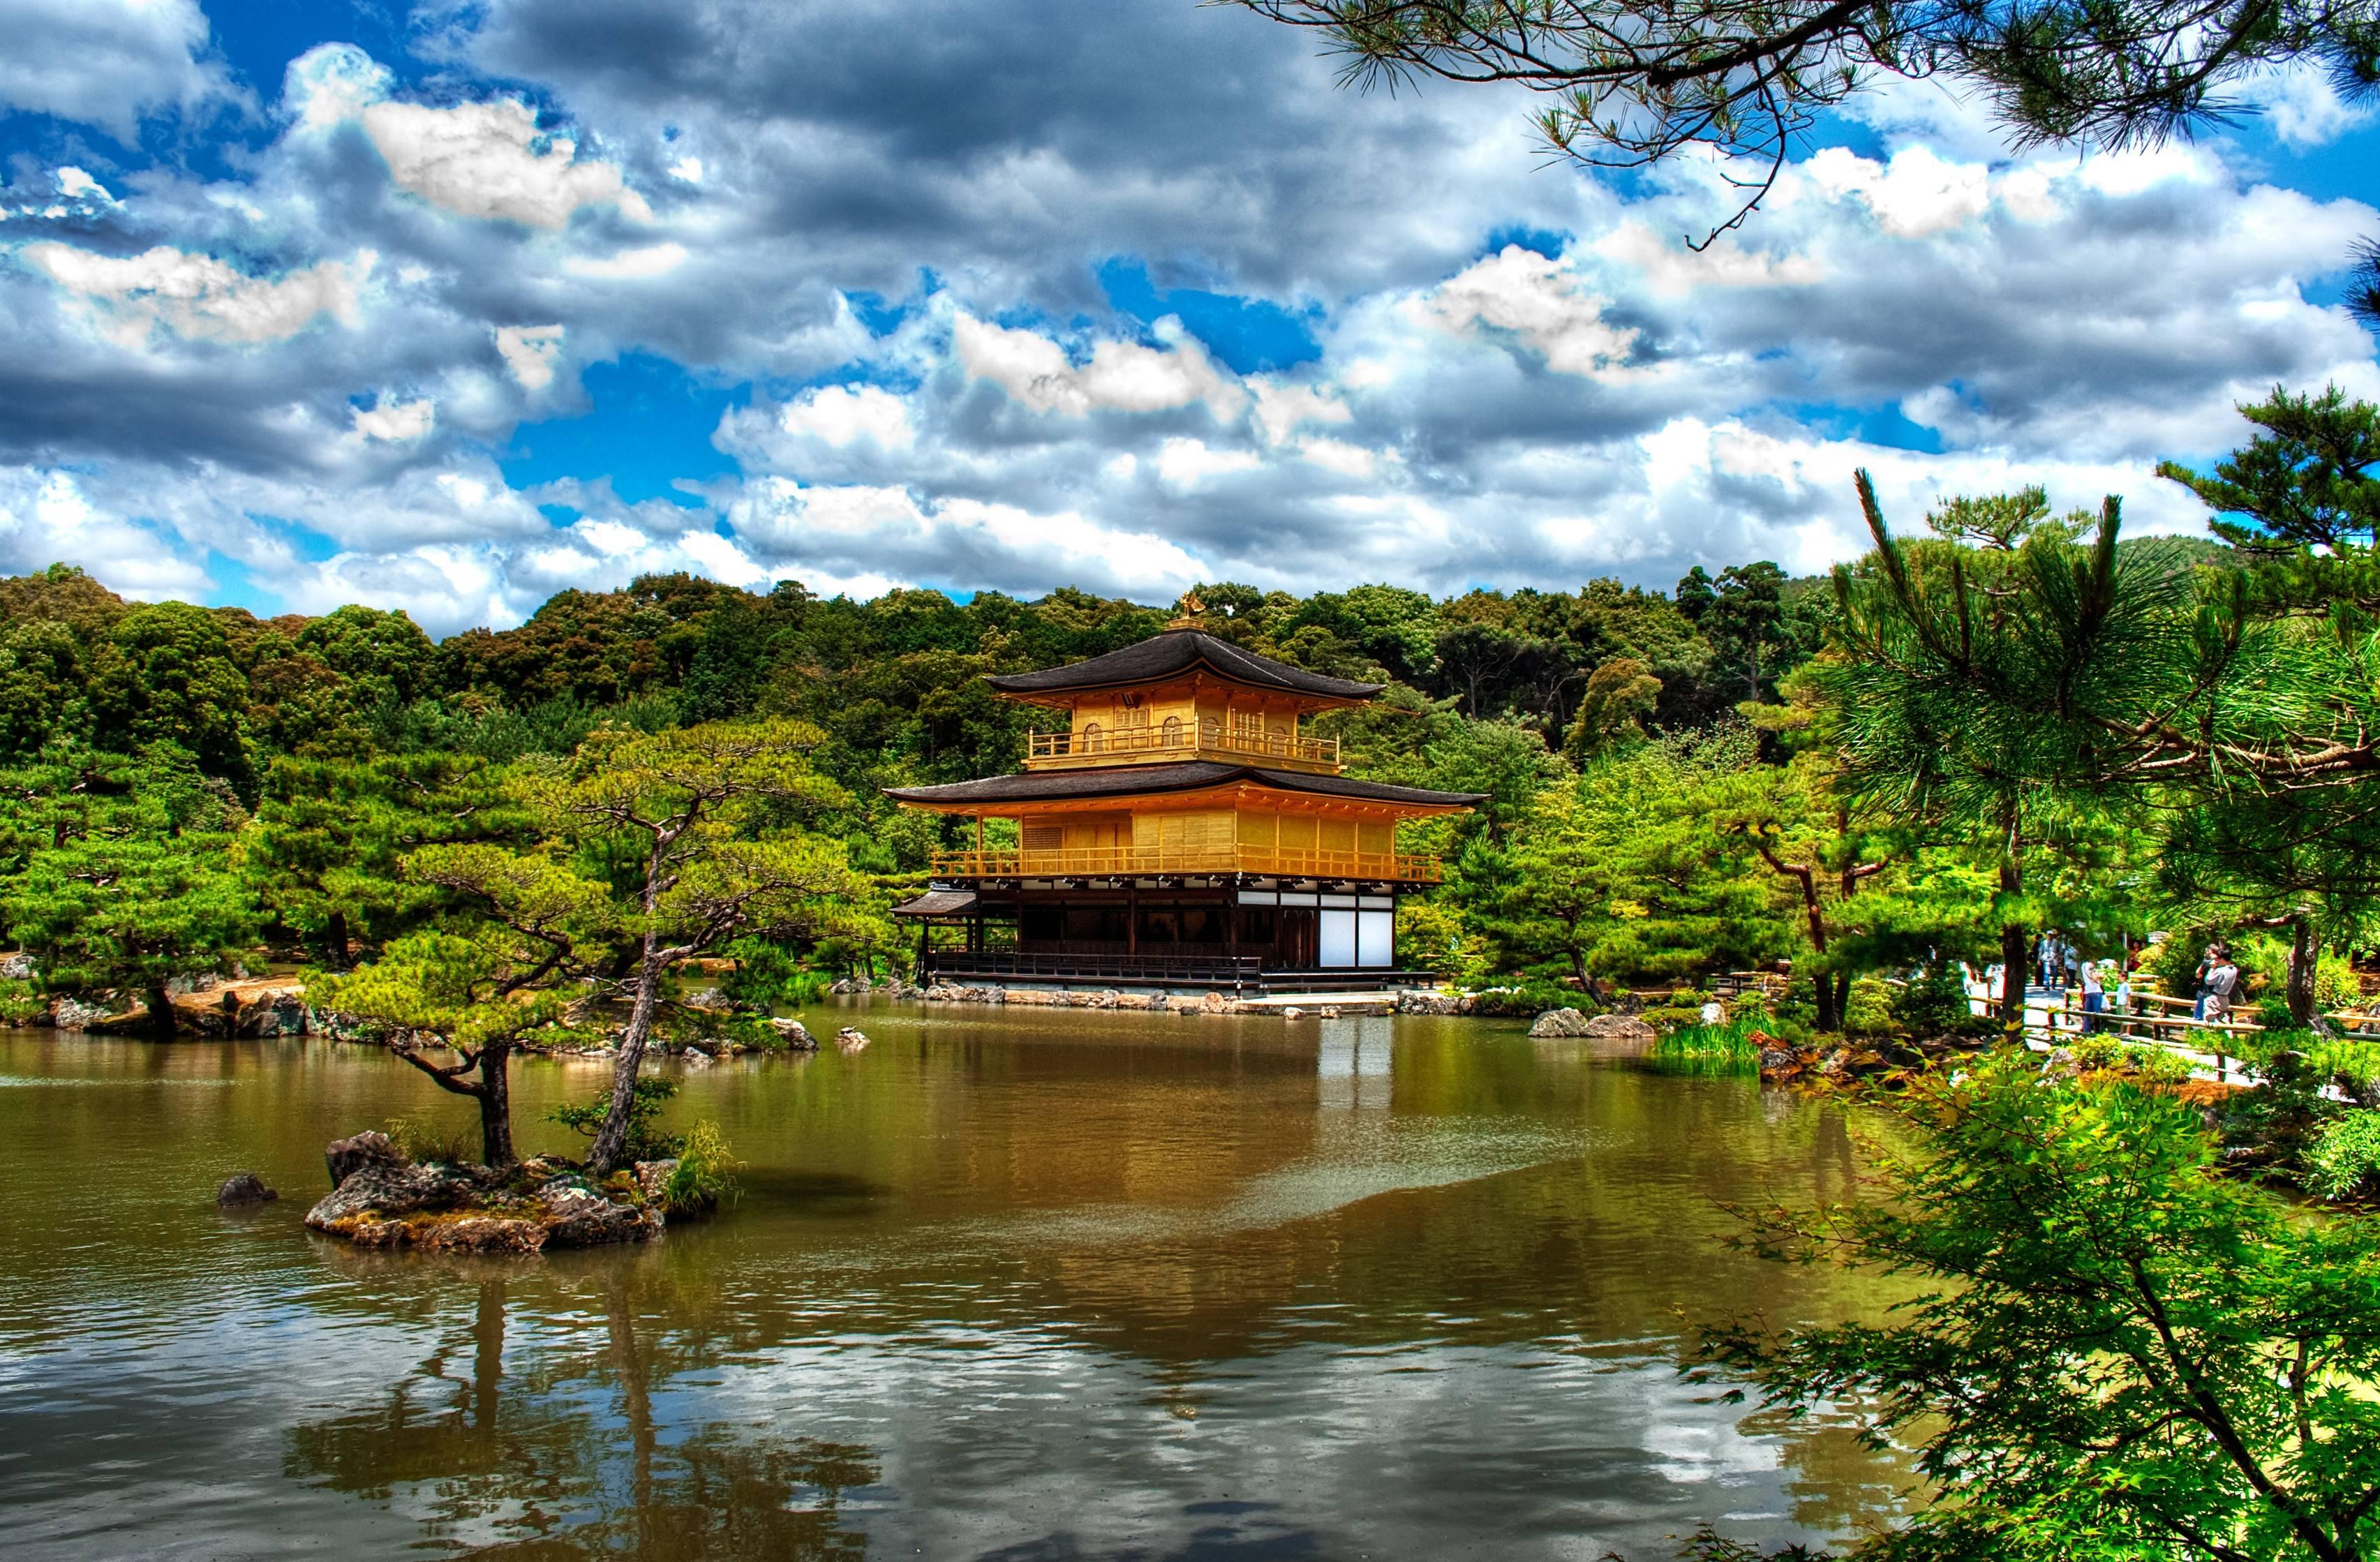 Kyoto Hdr 34102238 Wallpaper 2250088 3410x2238